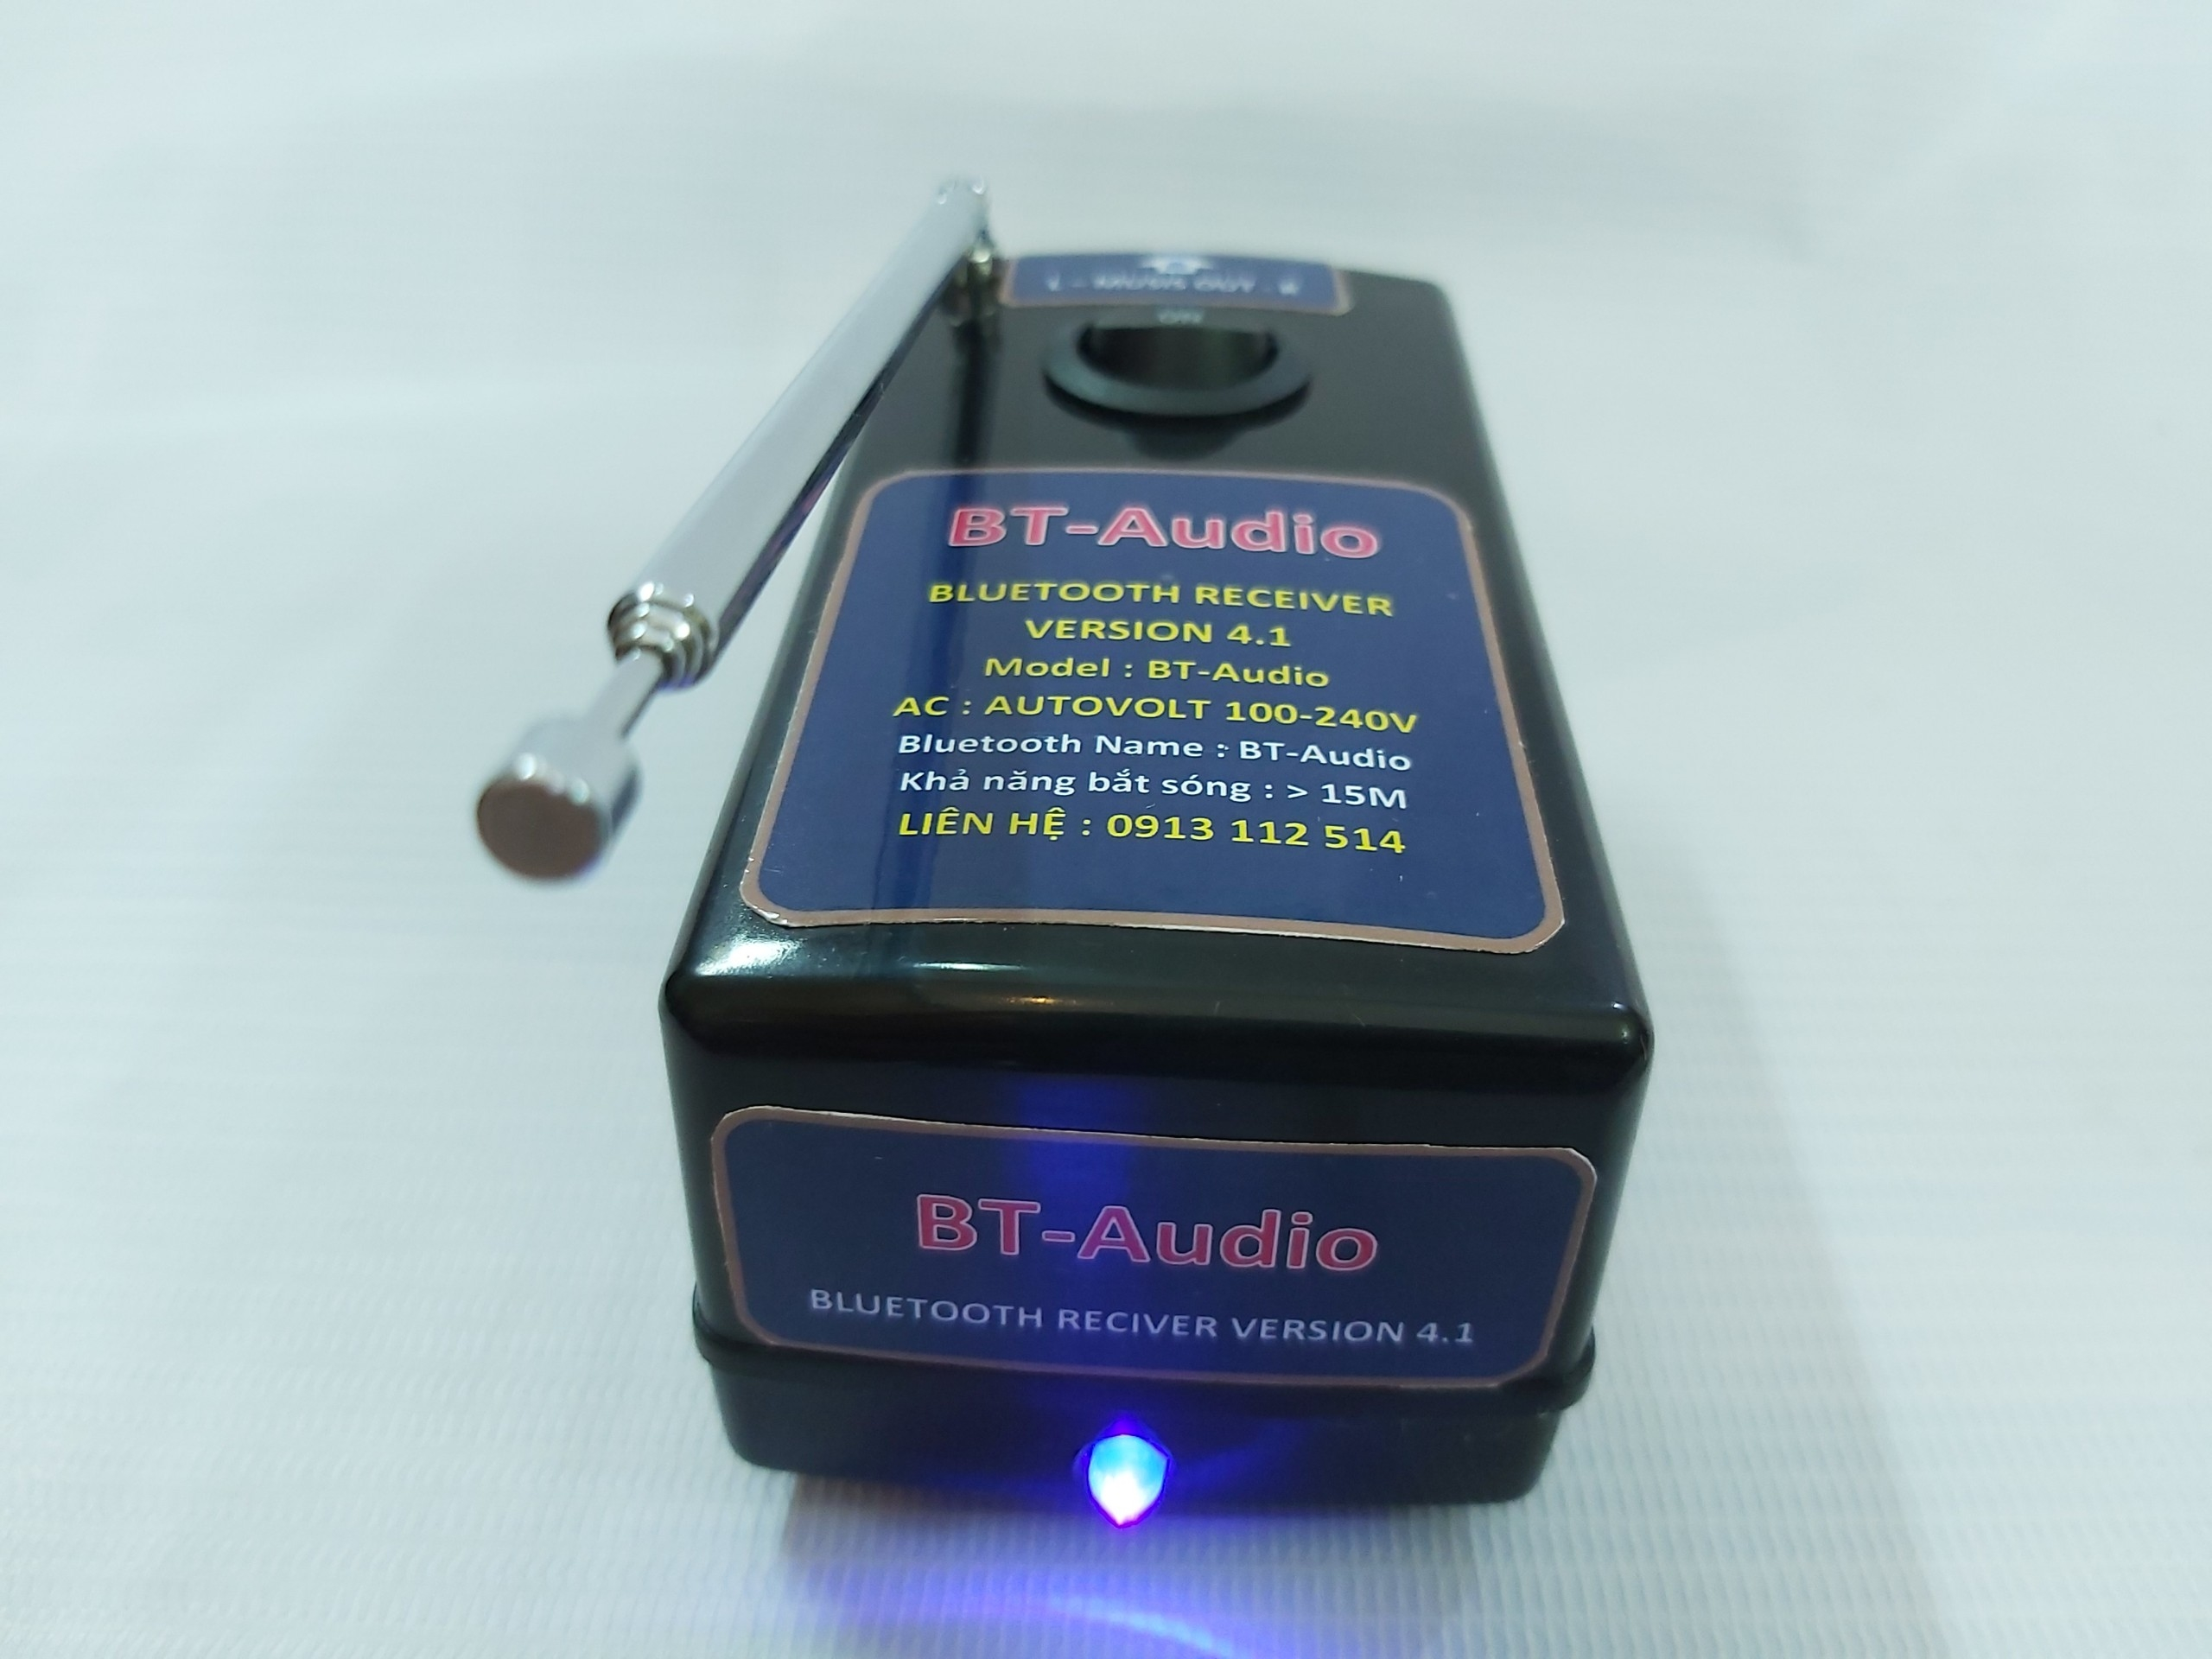 Thiết Bị Nhận BLUETOOTH 4.1 BT AUDIO - Nguồn Auto Volt